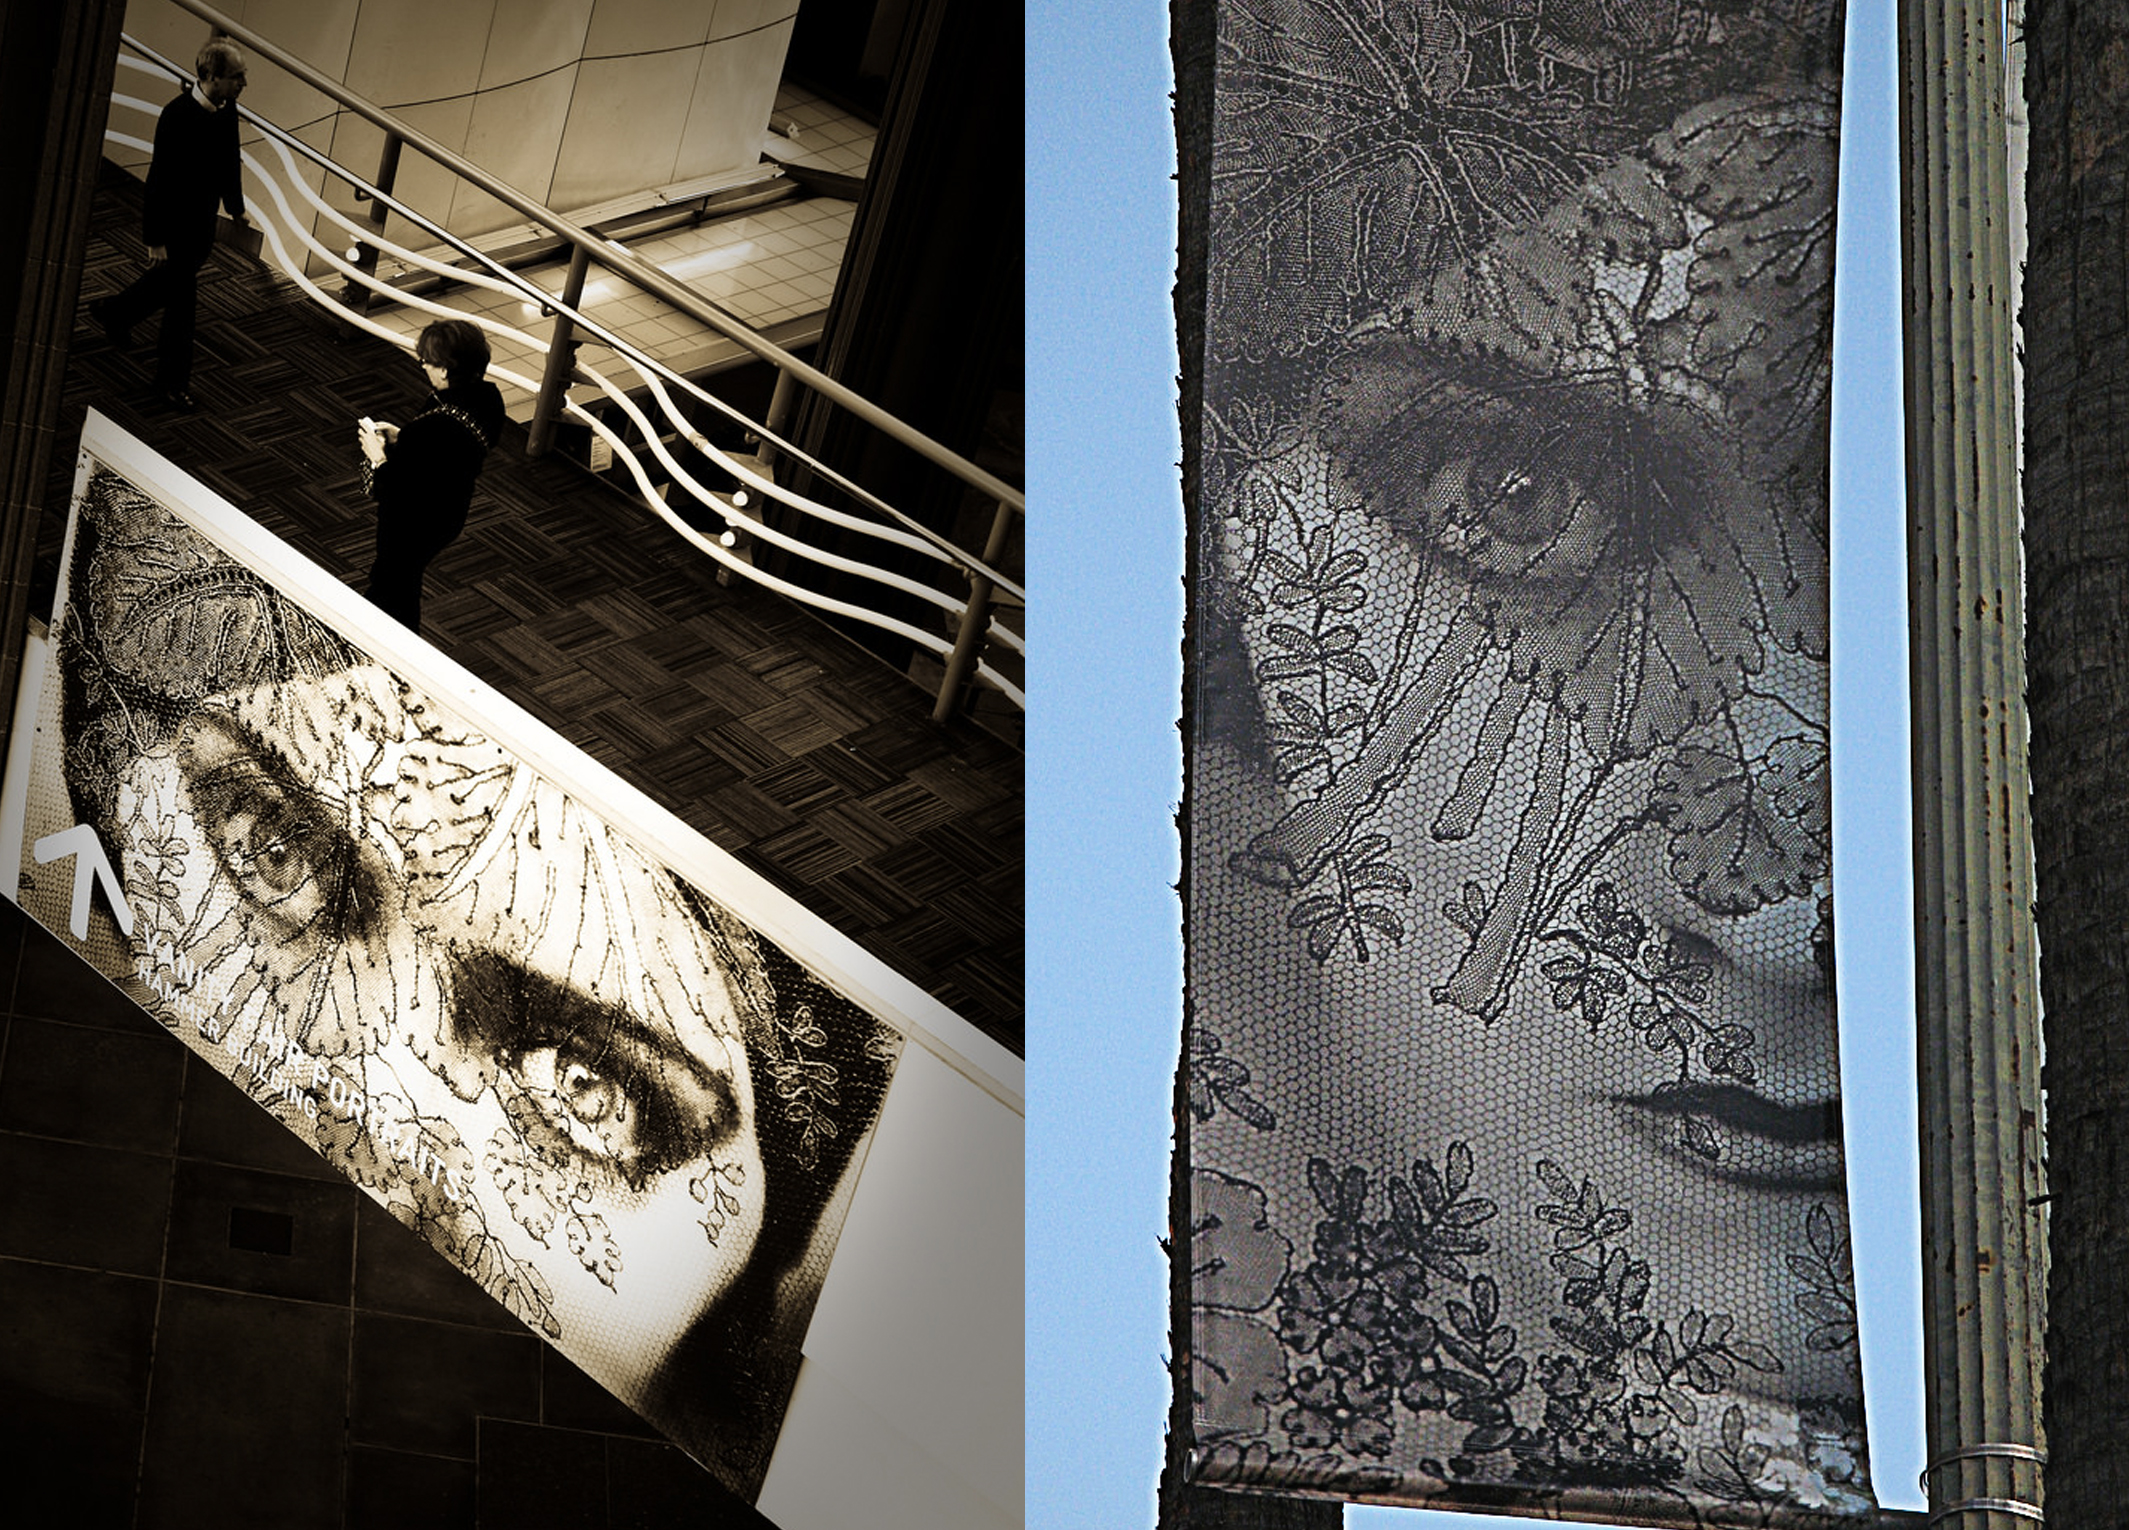 exhibitions-lacma 4.jpg